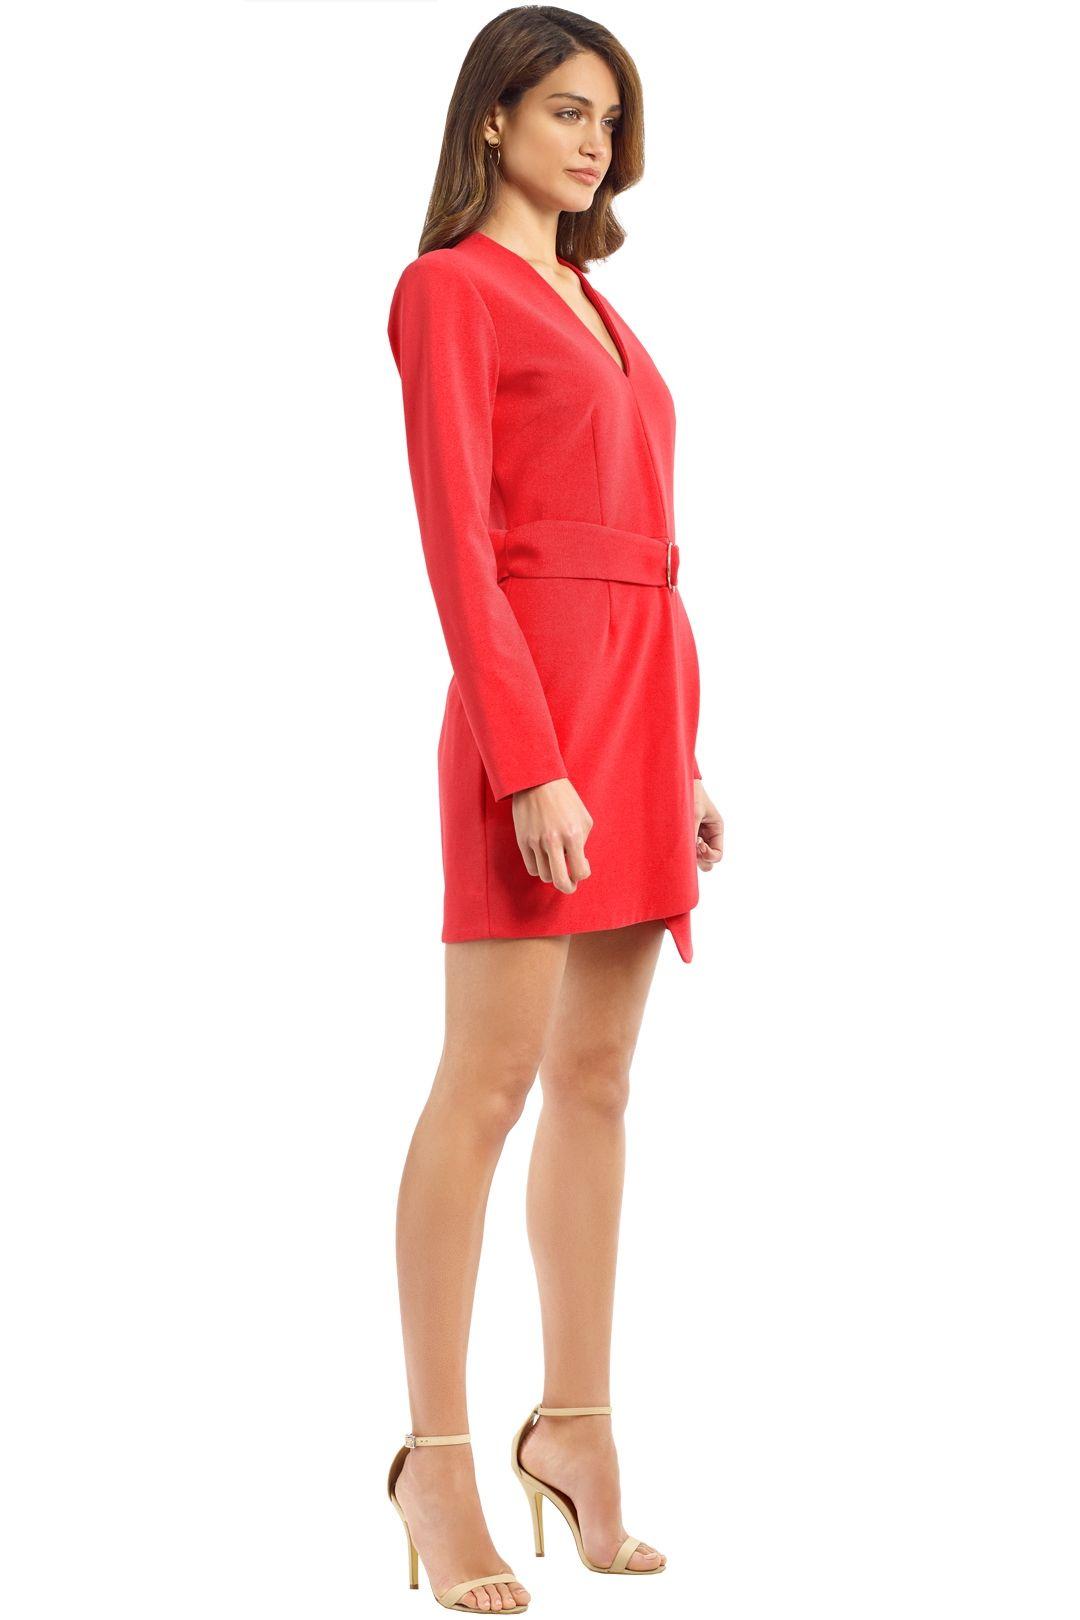 Rebecca Vallance - Domingo V LS Mini Dress - Calyspo - Side